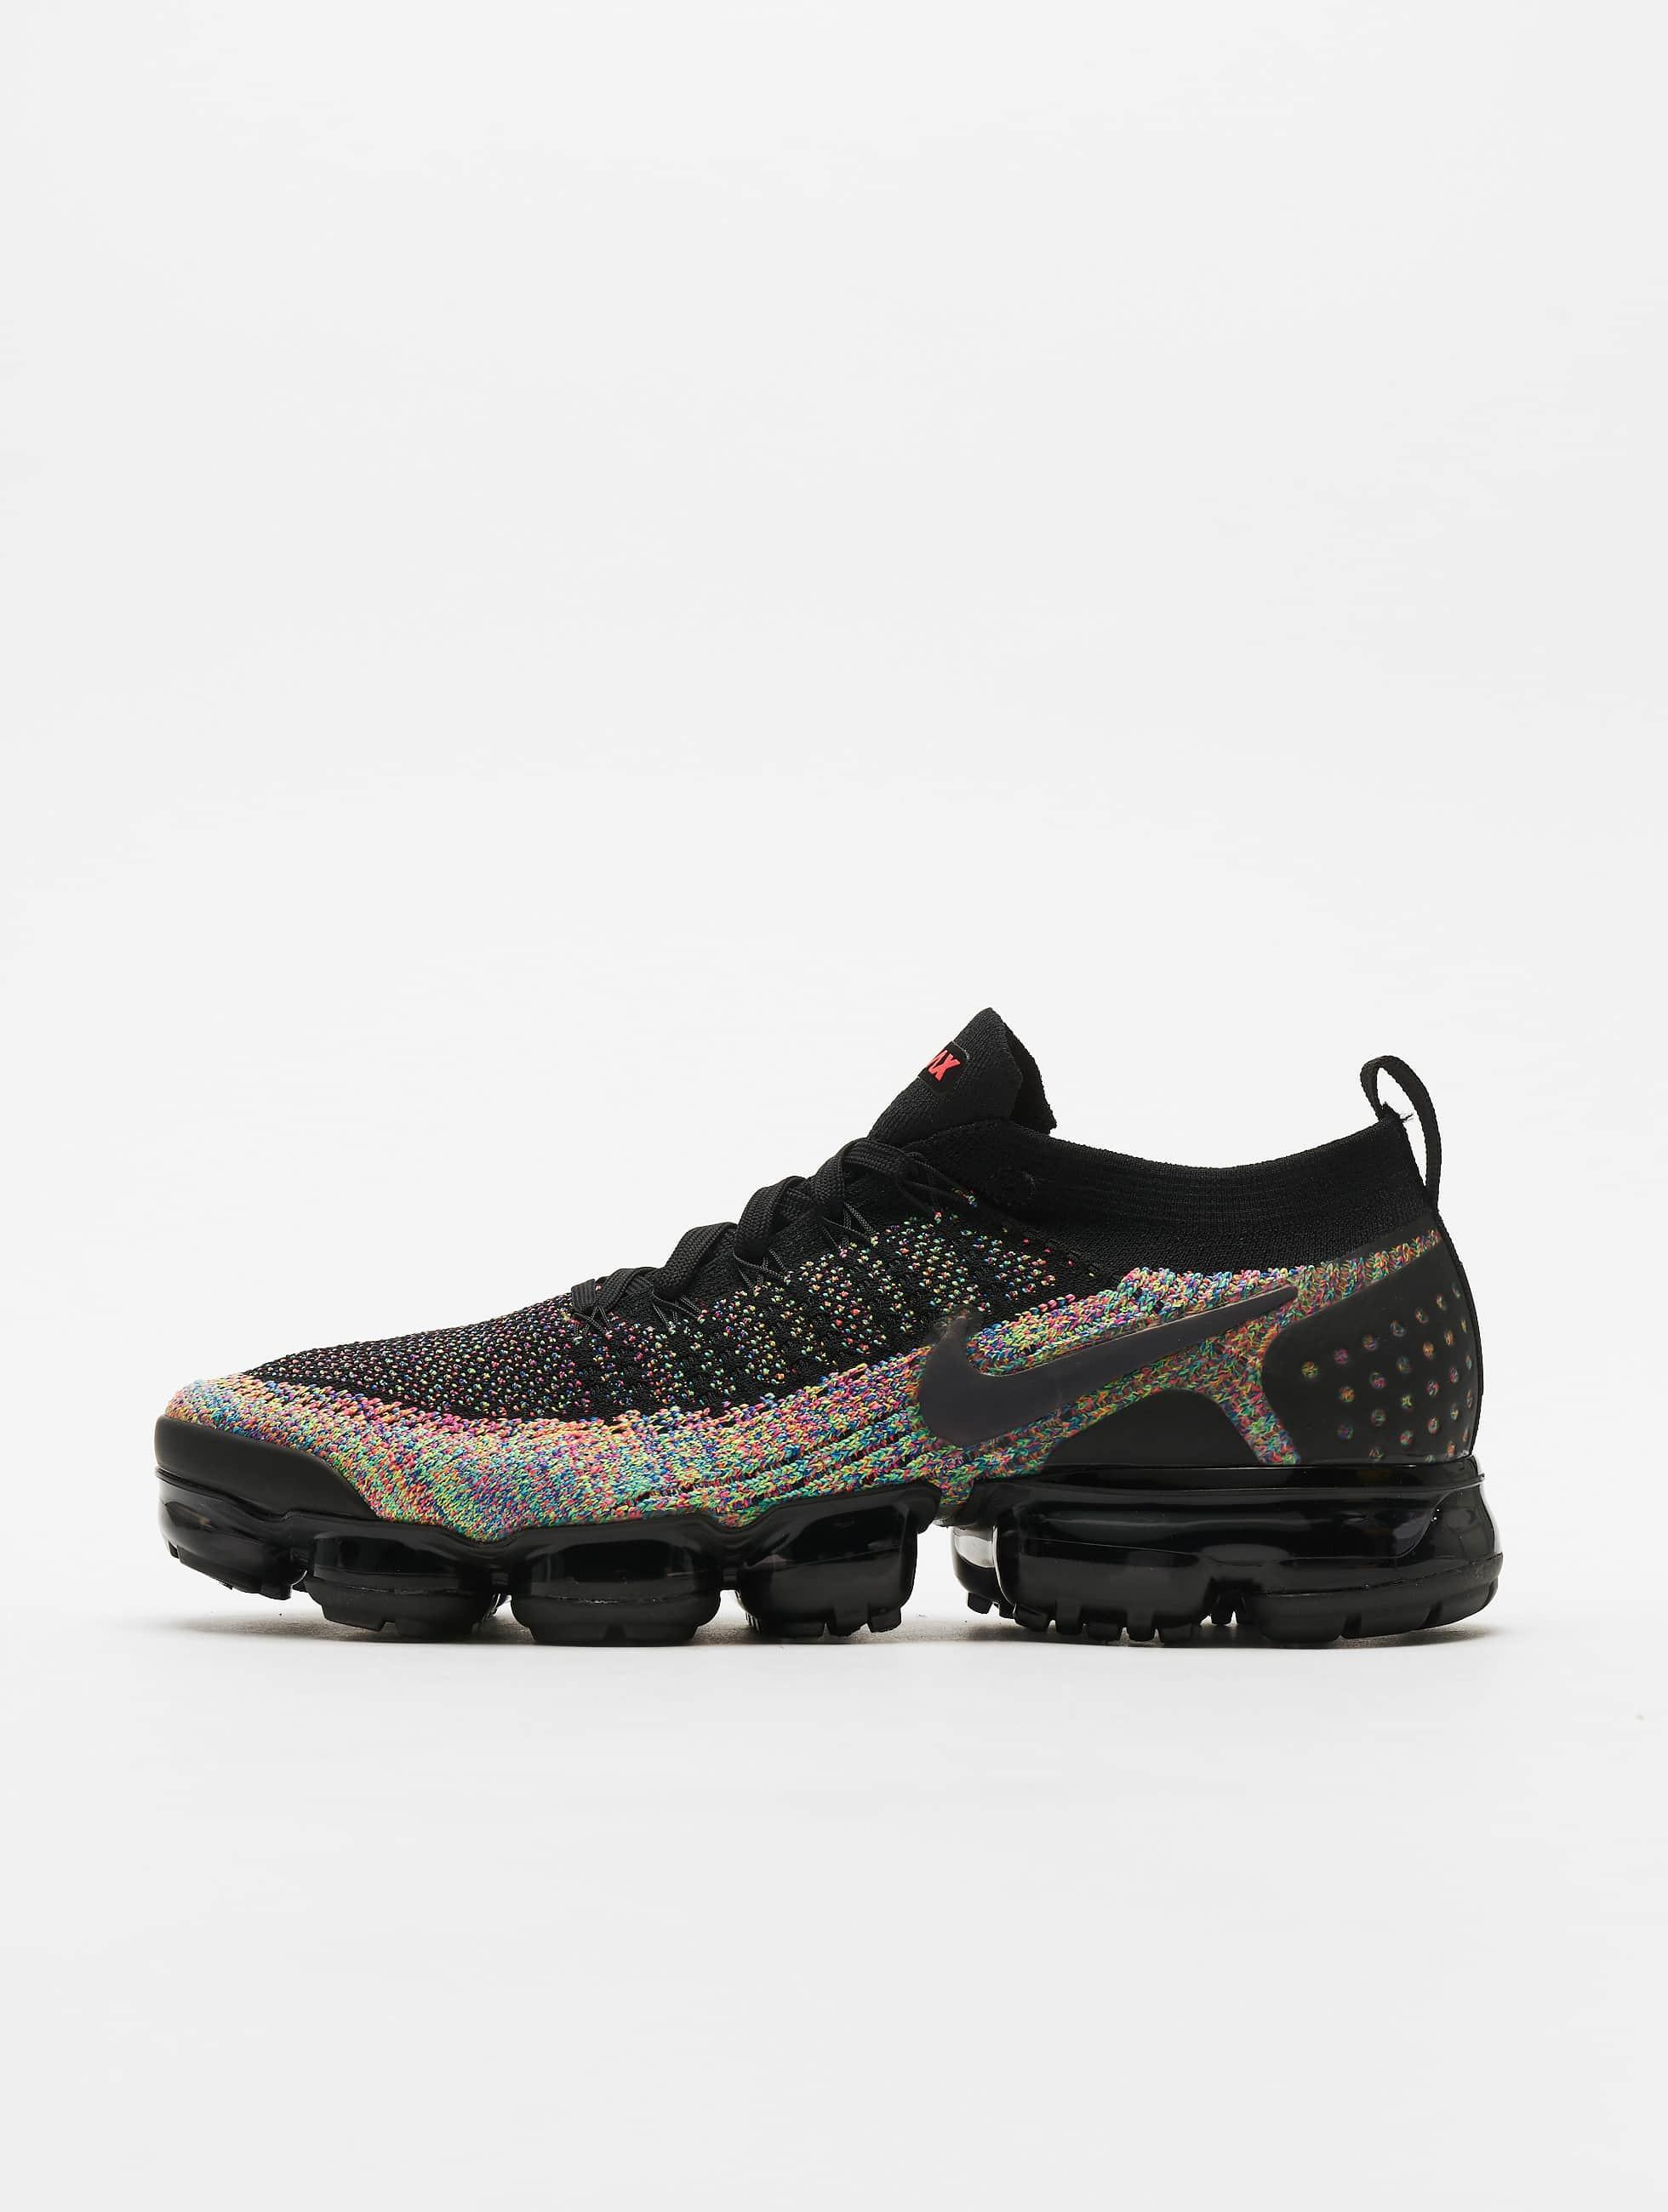 Nike Air Vapormax Flyknit 2 Sneakers Black/Black/Racer Pink/Racer Blue